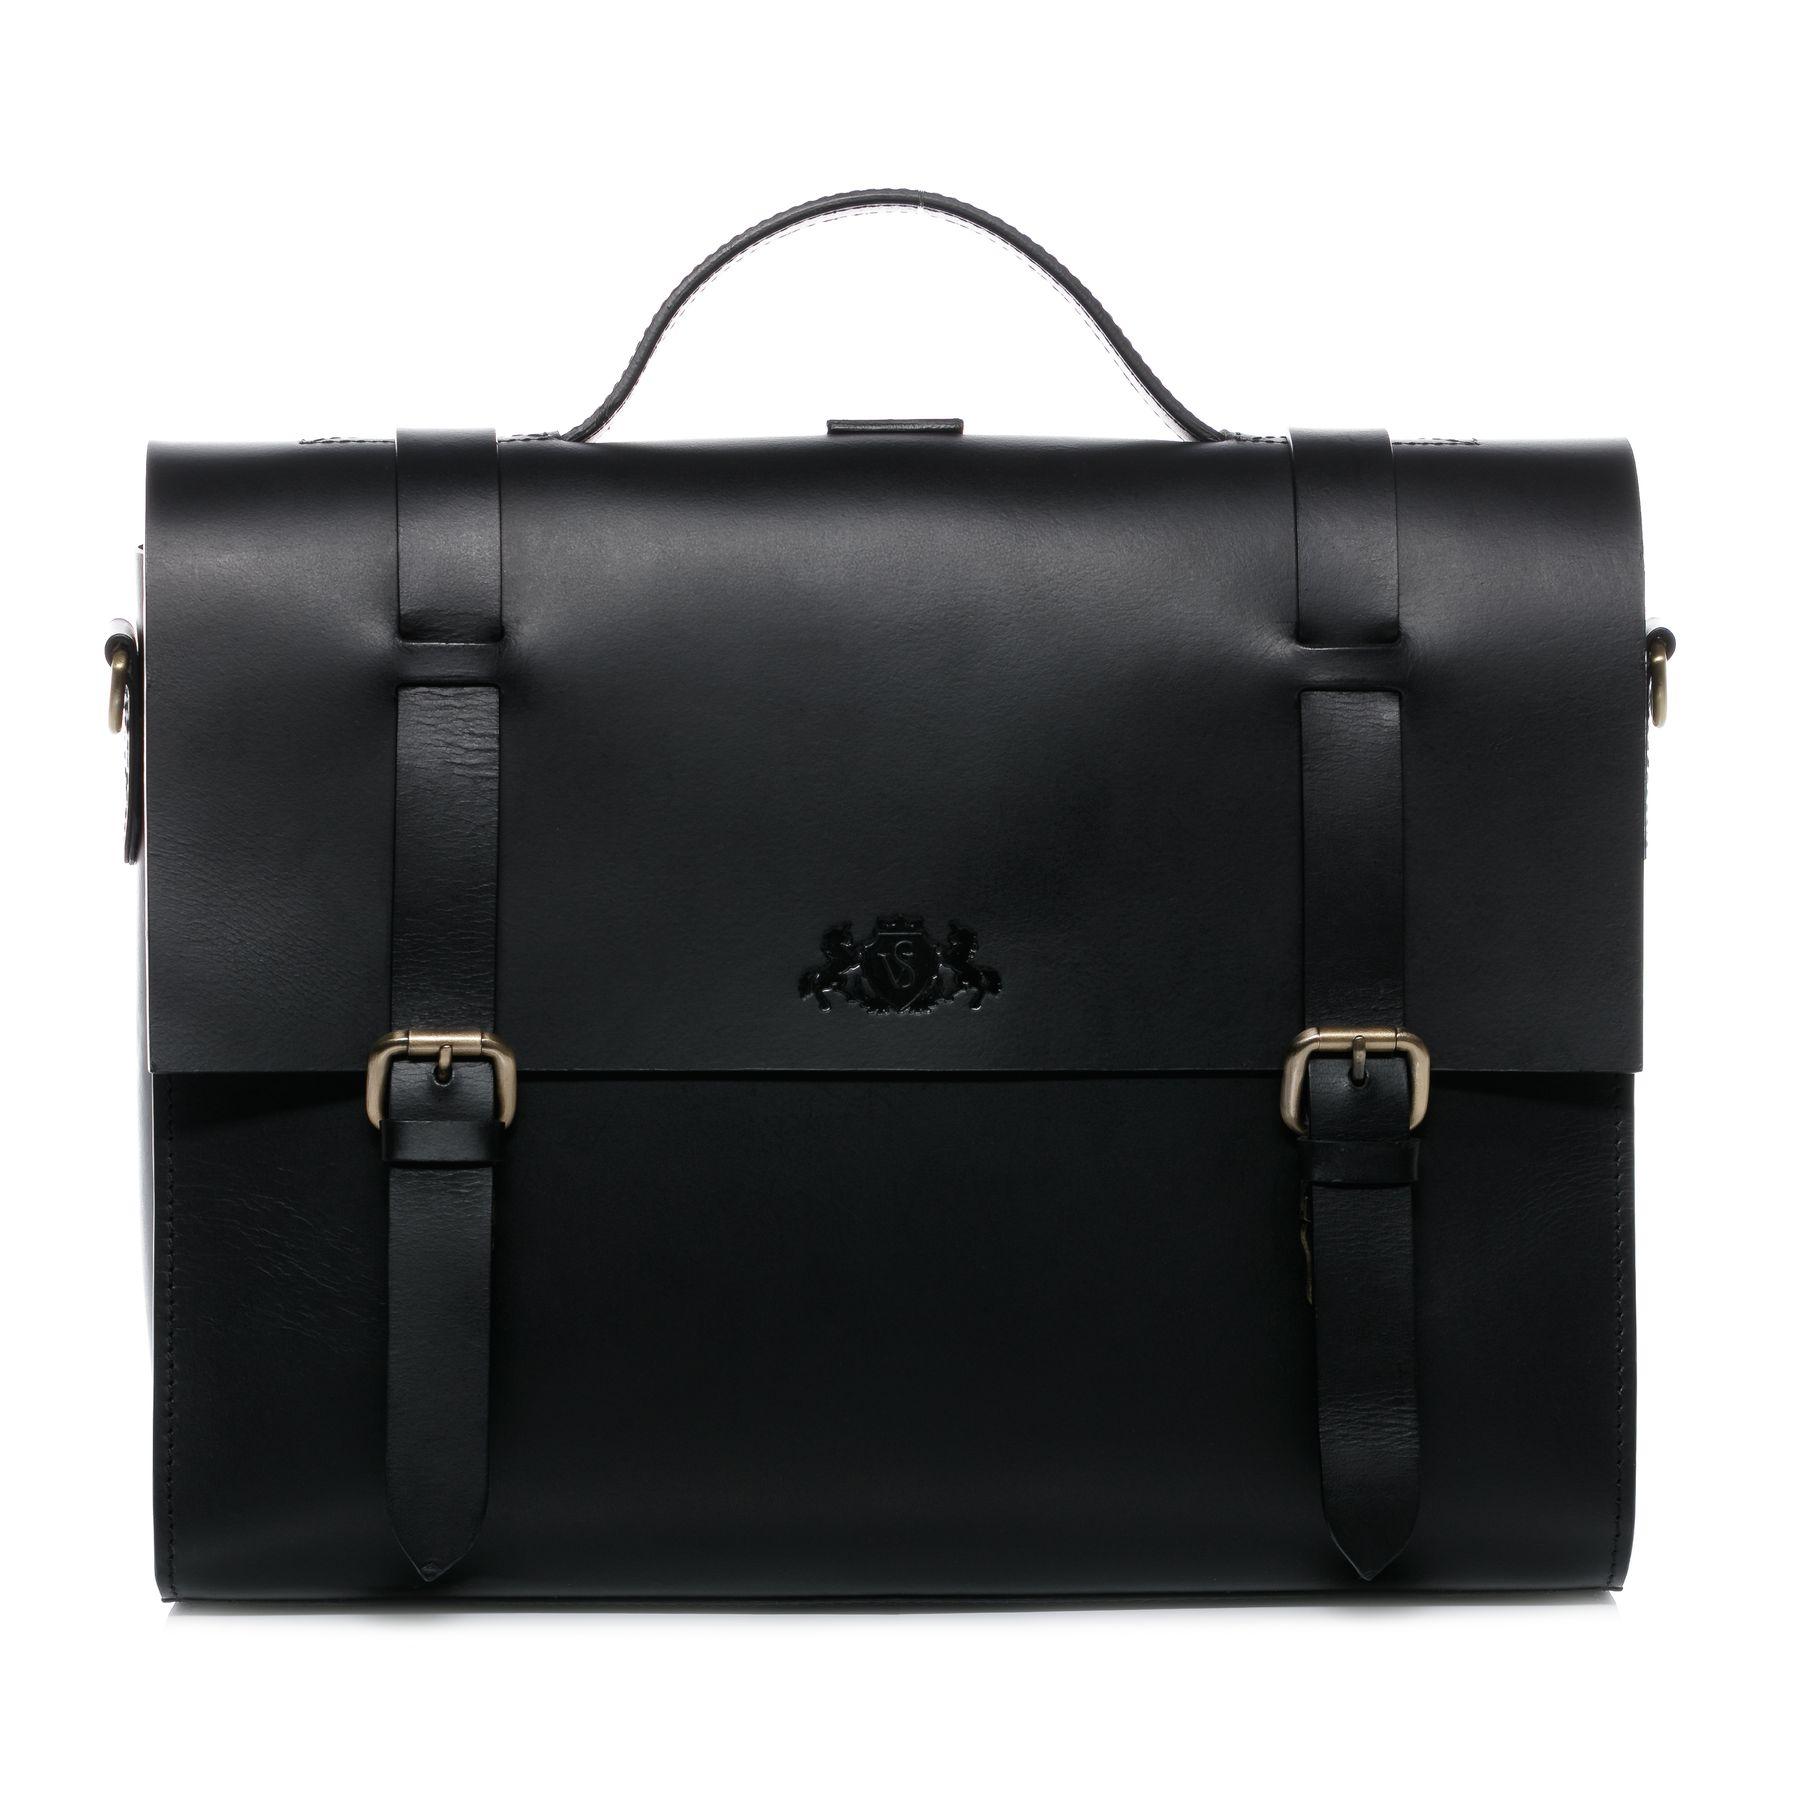 08e20697a SID & VAIN briefcase & backpack Saddle Leather BOSTON DUO black office  laptop business bag portable computer shoulder bag Business